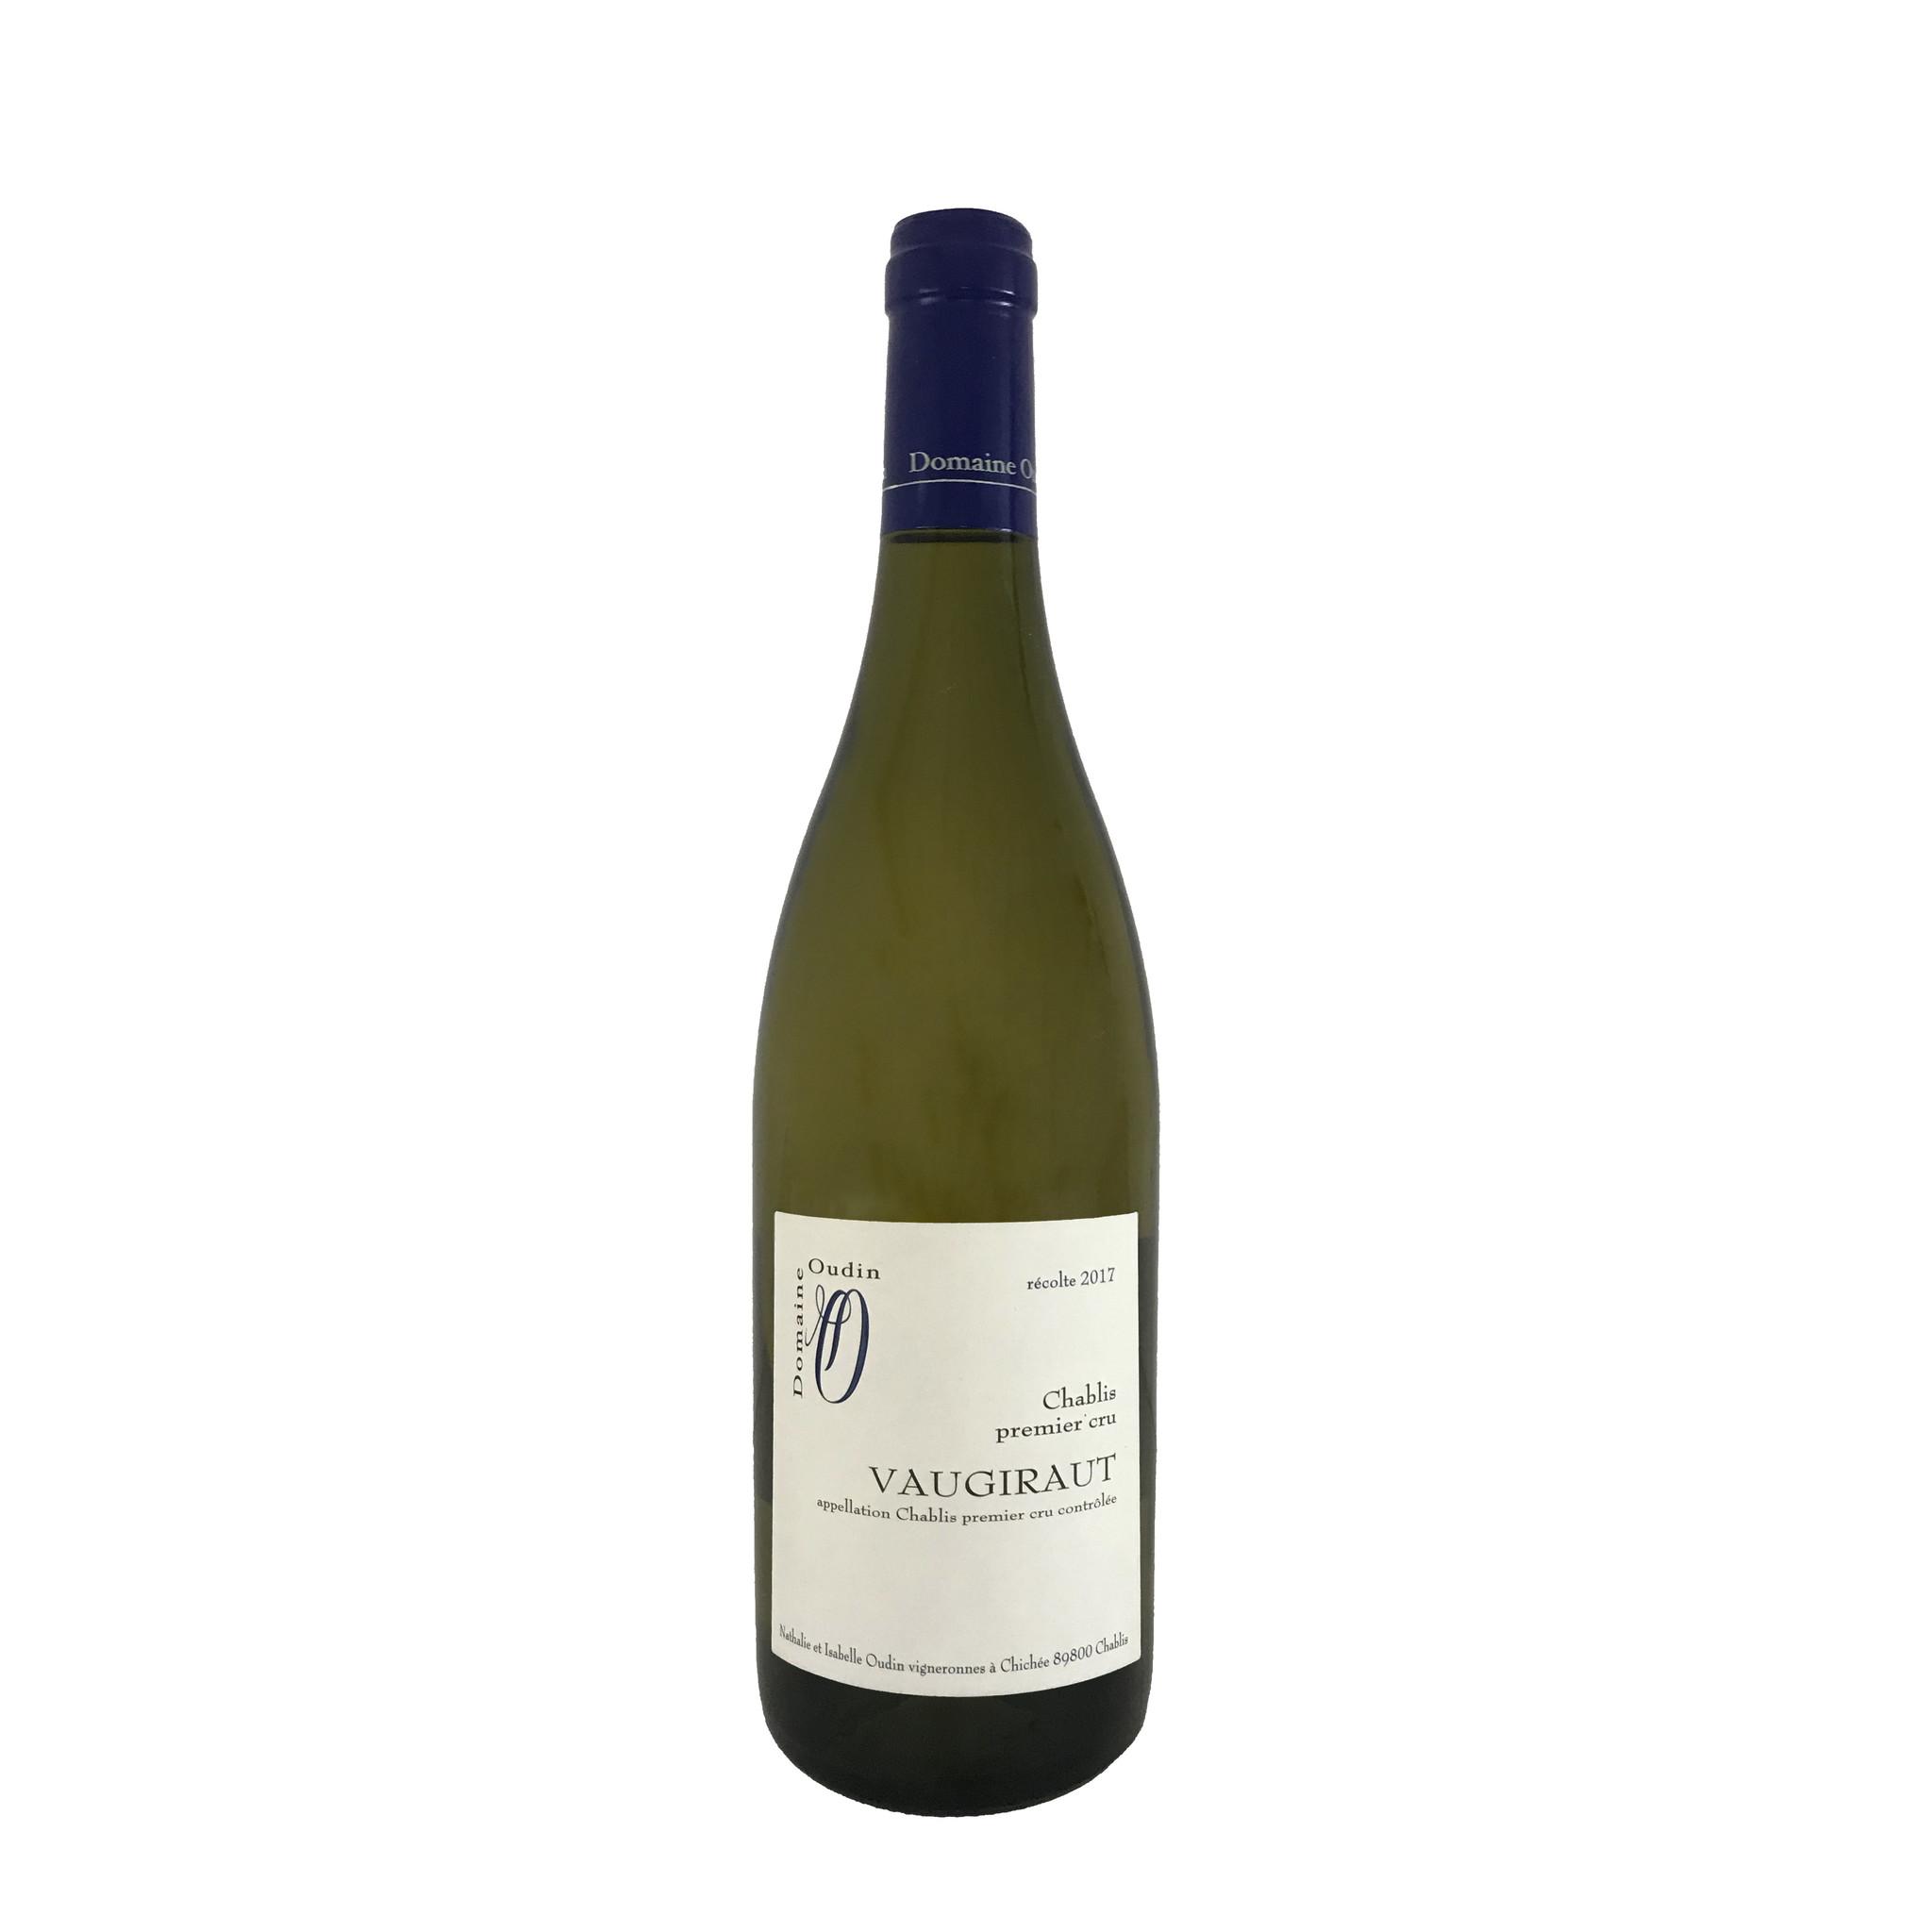 Domaine Oudin - Chablis premier cru - Vaugiraut-1